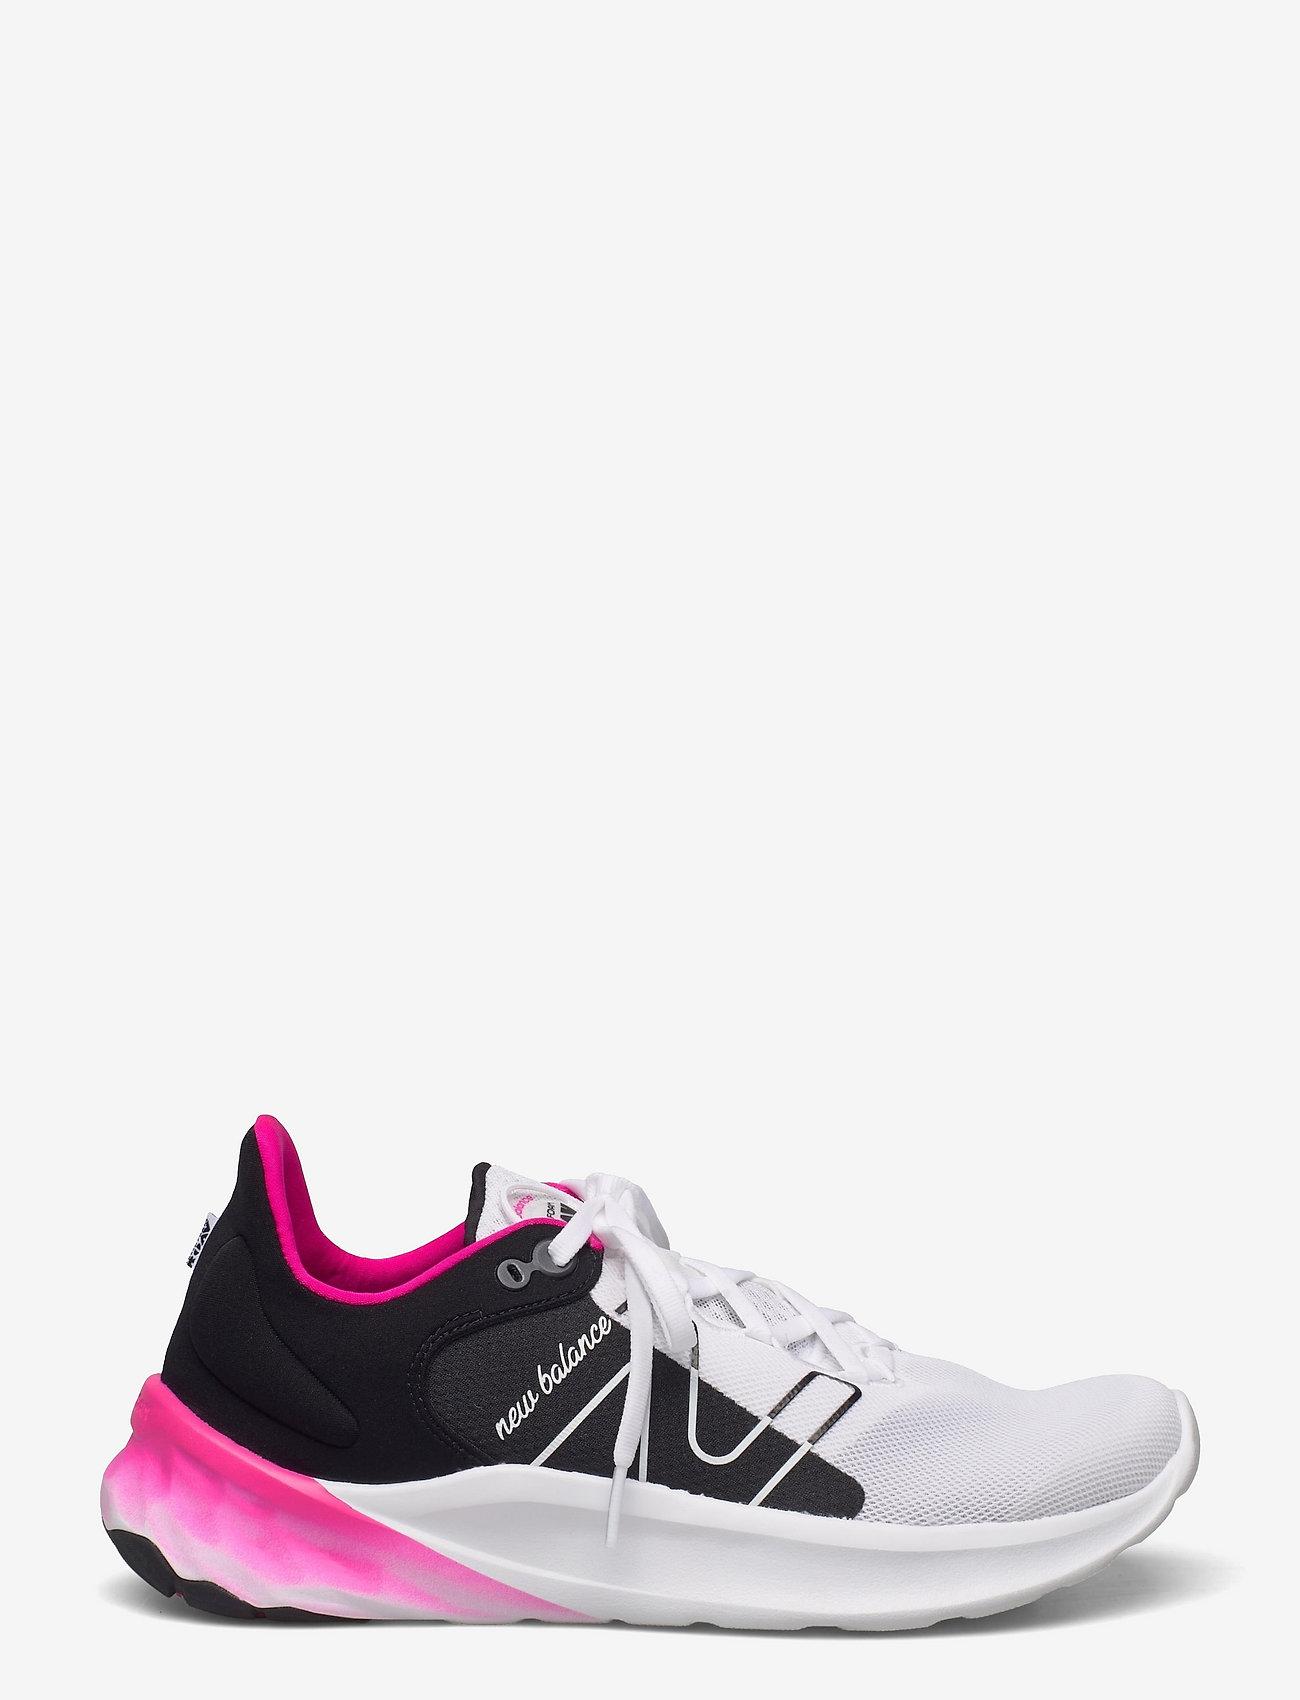 New Balance - WROAVSW2 - running shoes - white/black - 1